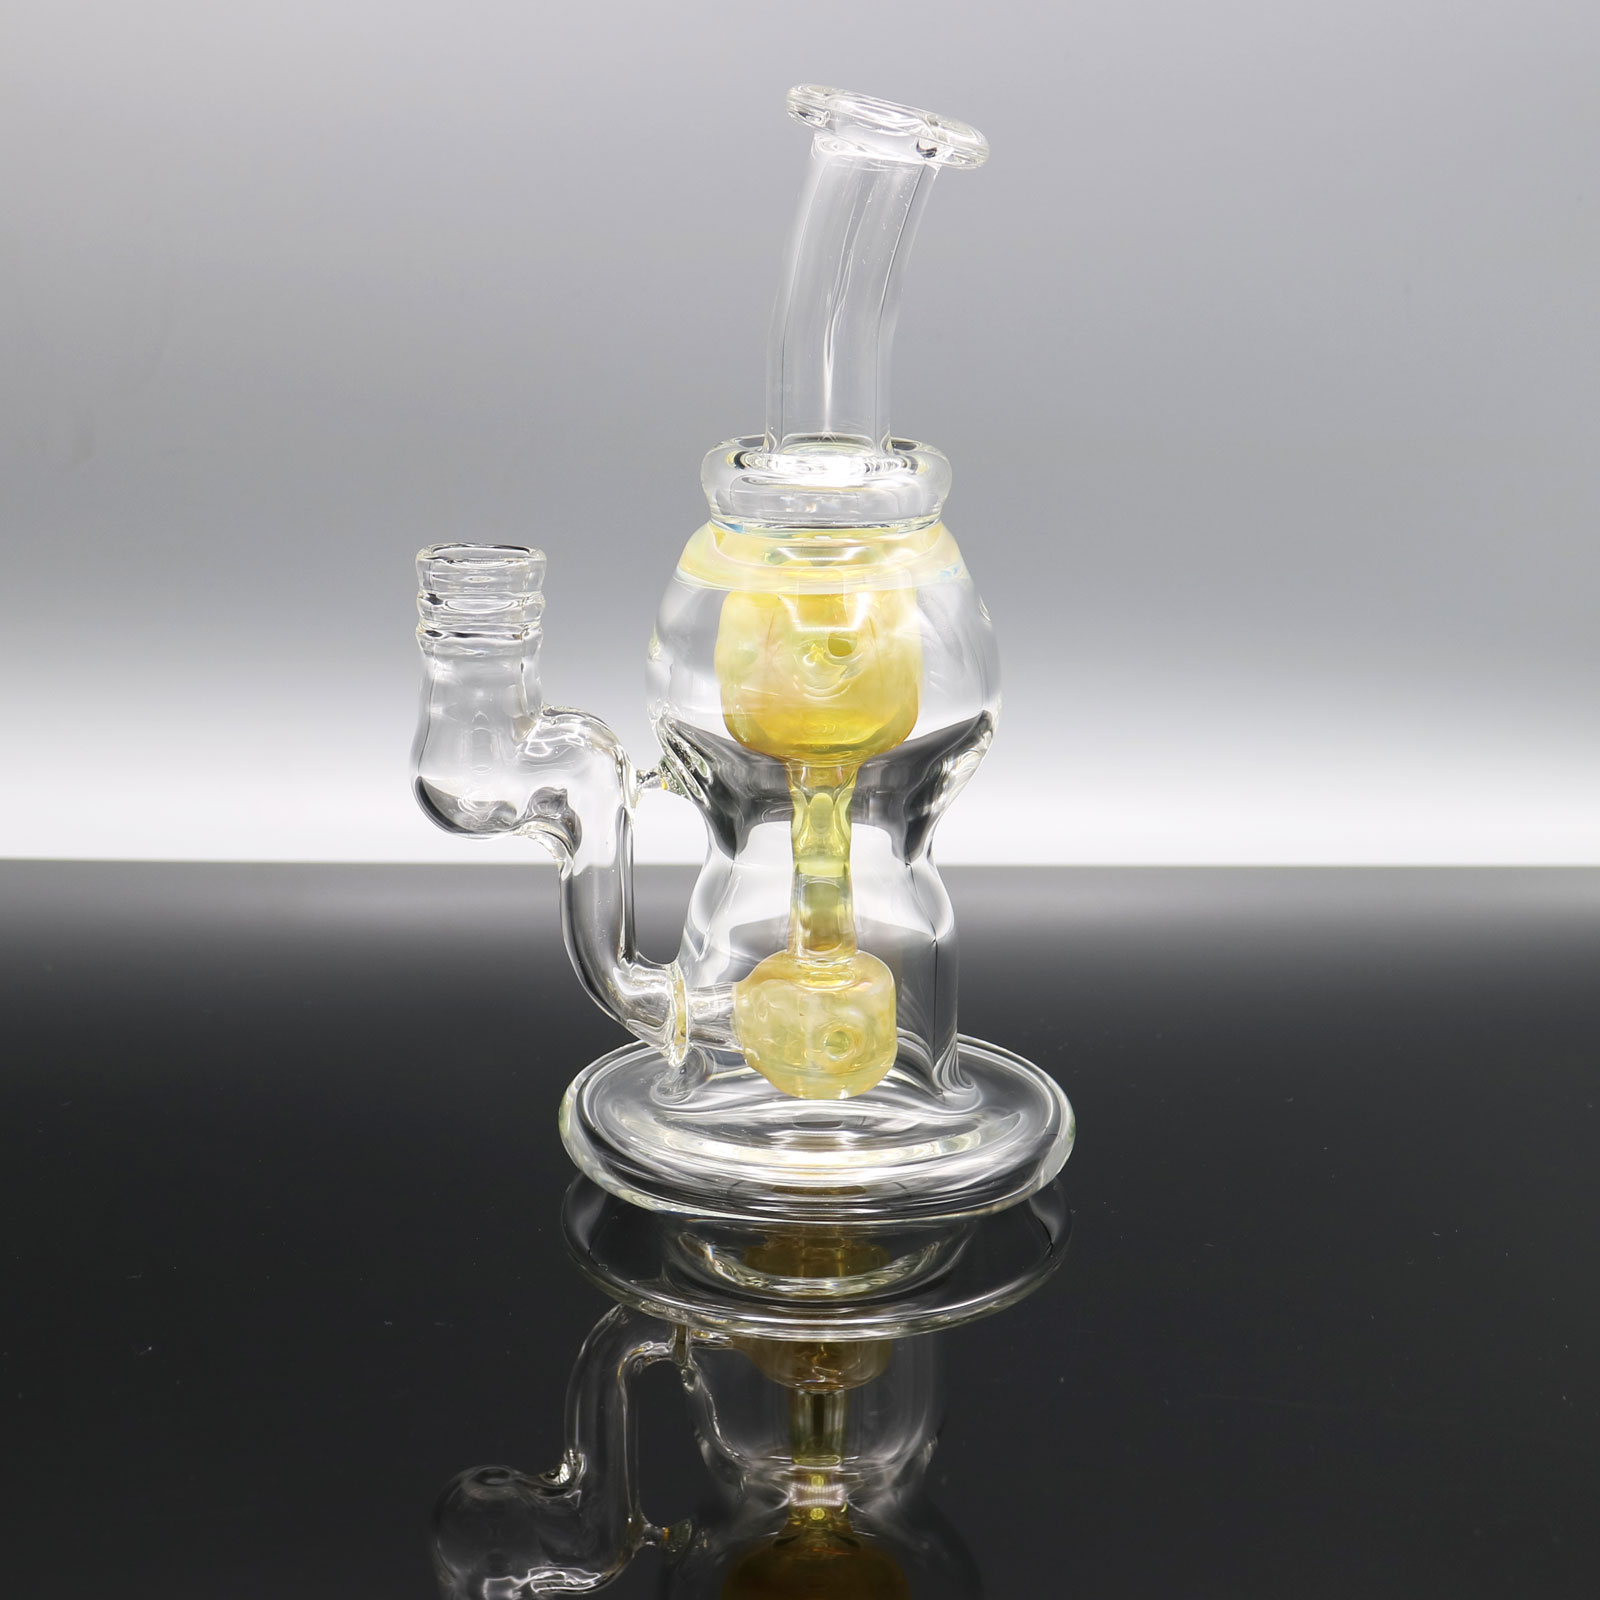 Costa Glass – Fumed Gumball Torus